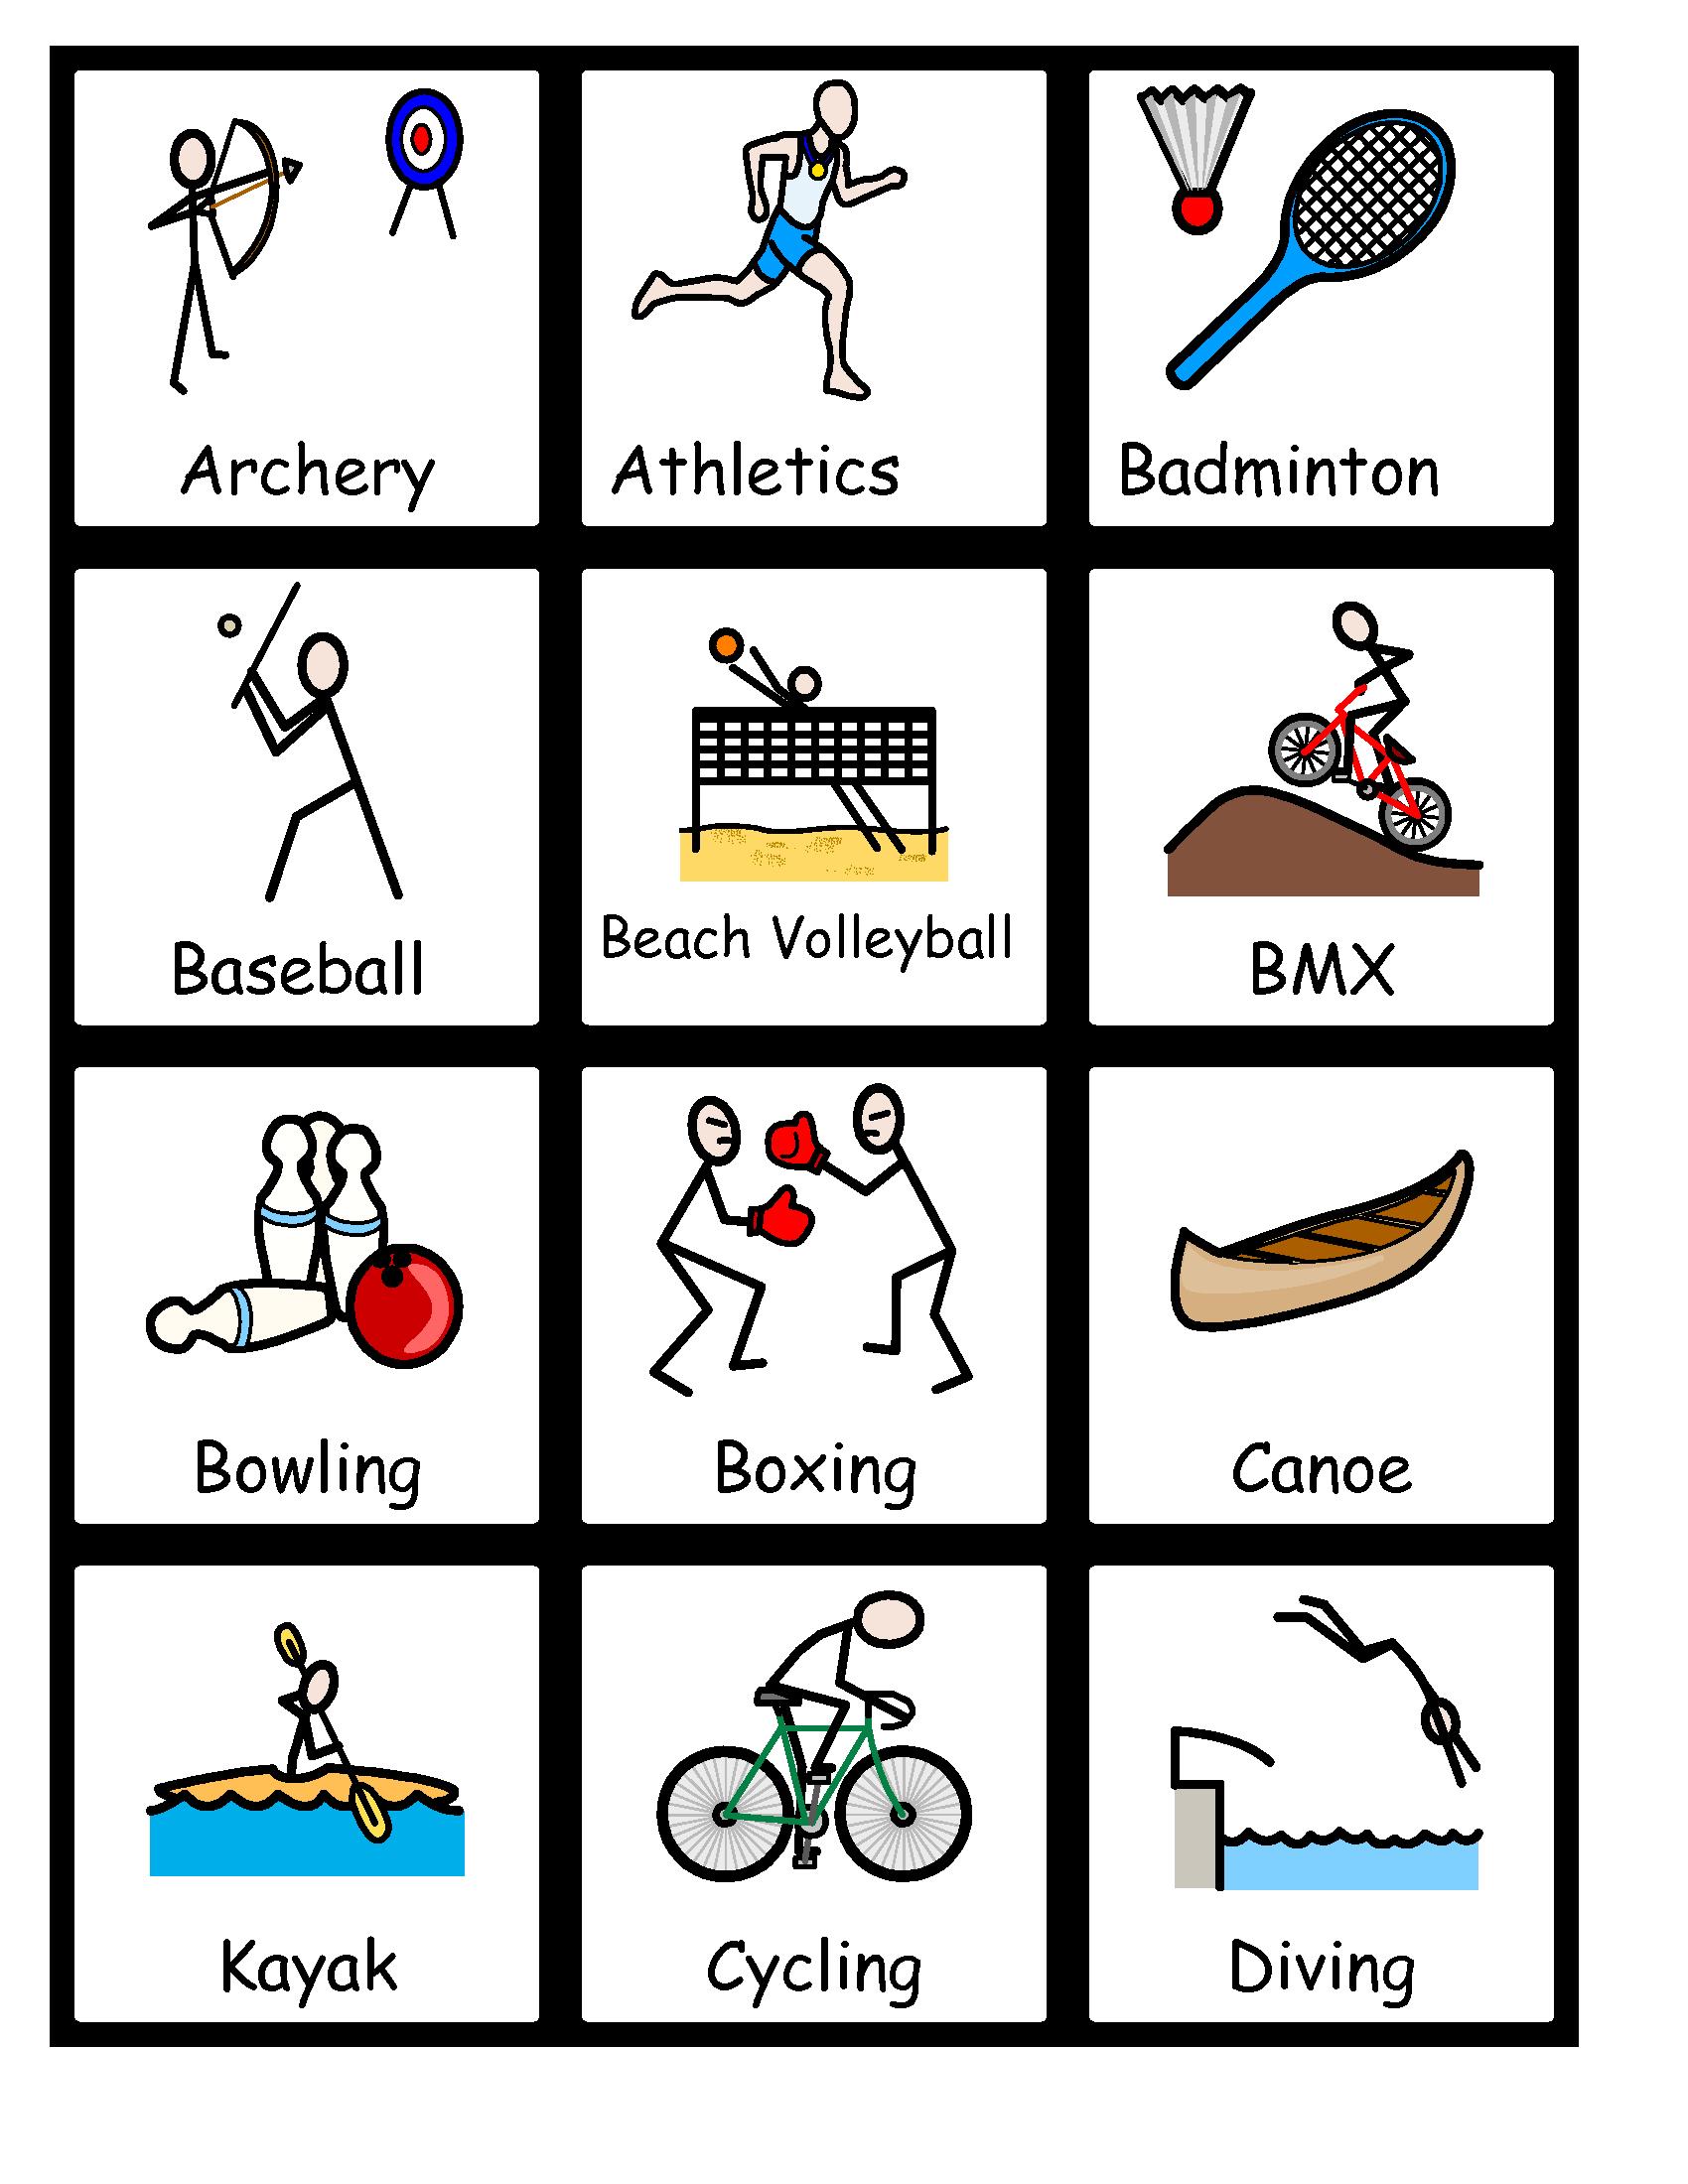 Free Symbolized Resources For 2015 Pan Am Games – Bridges News - Free Printable Widgit Symbols